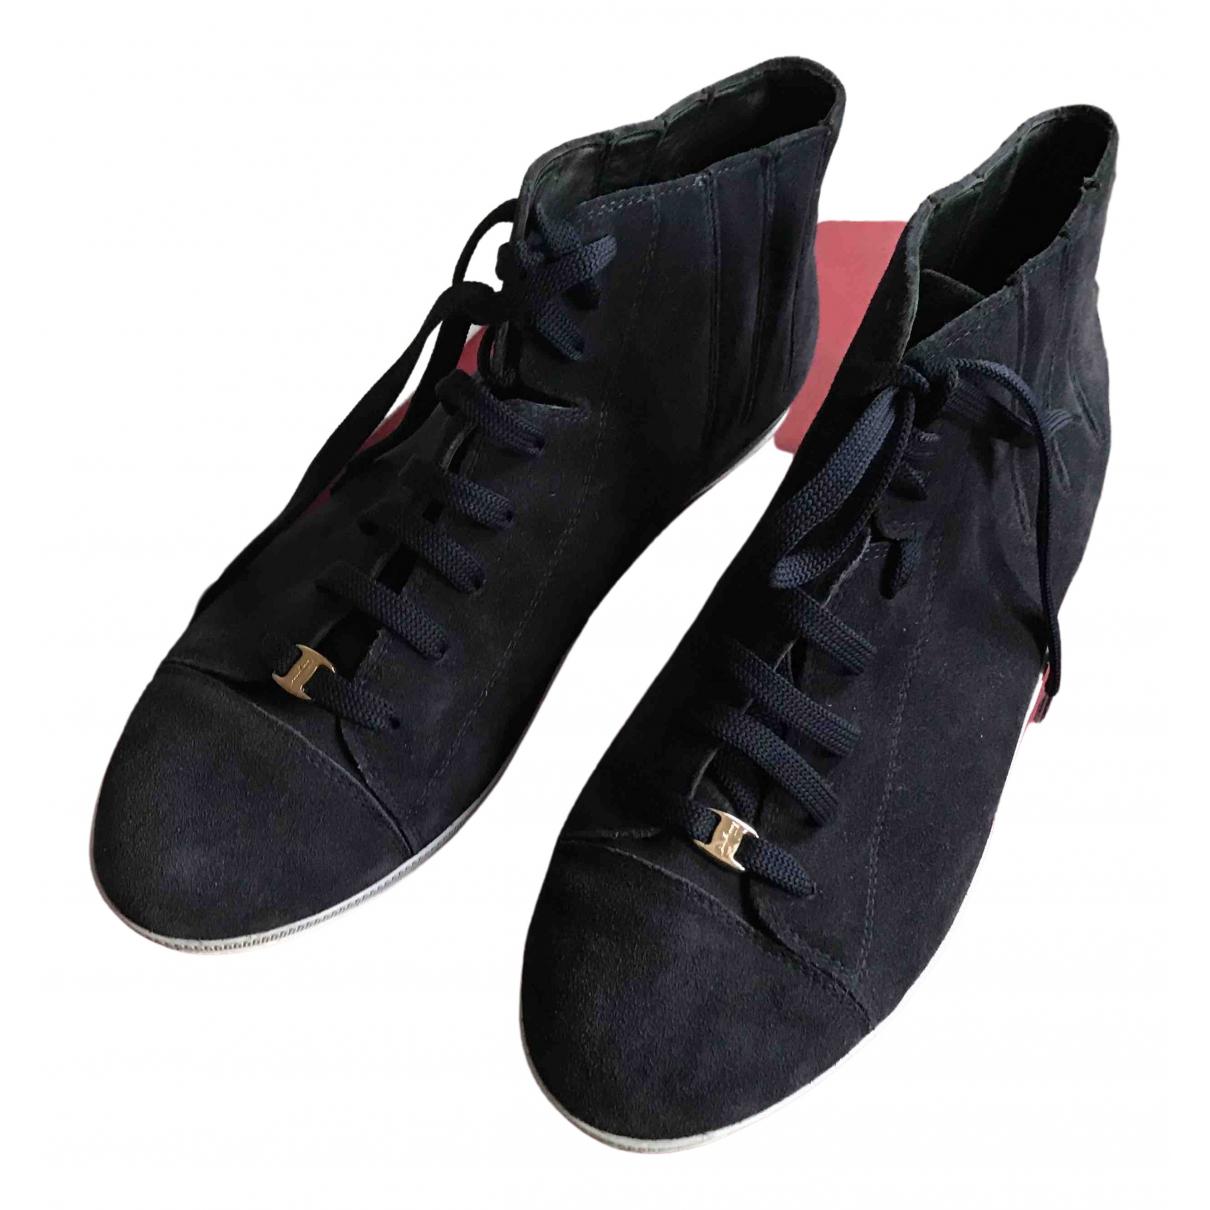 Salvatore Ferragamo \N Sneakers in  Blau Veloursleder